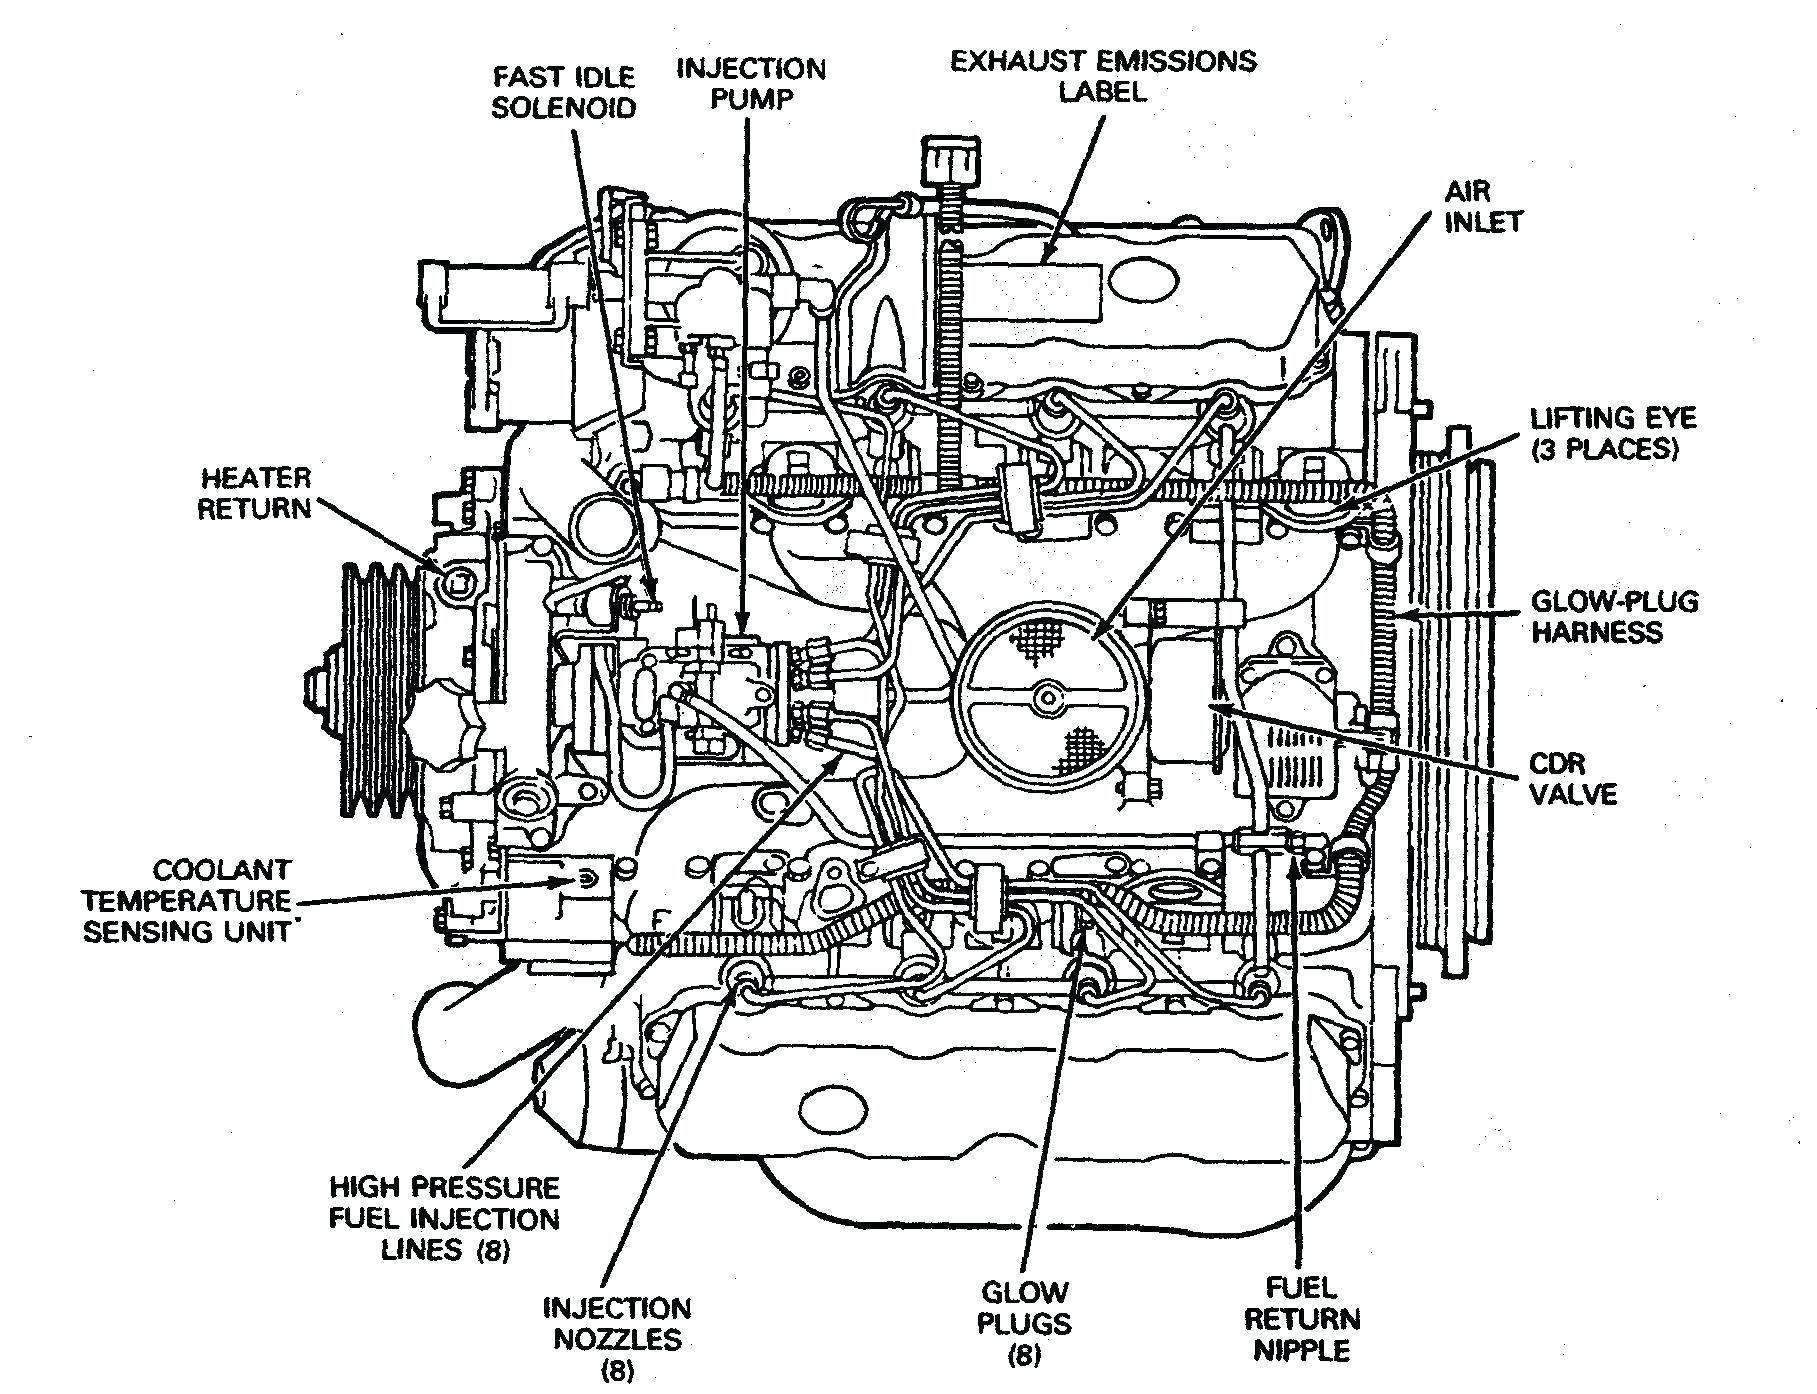 1995 Ford Explorer Engine Diagram